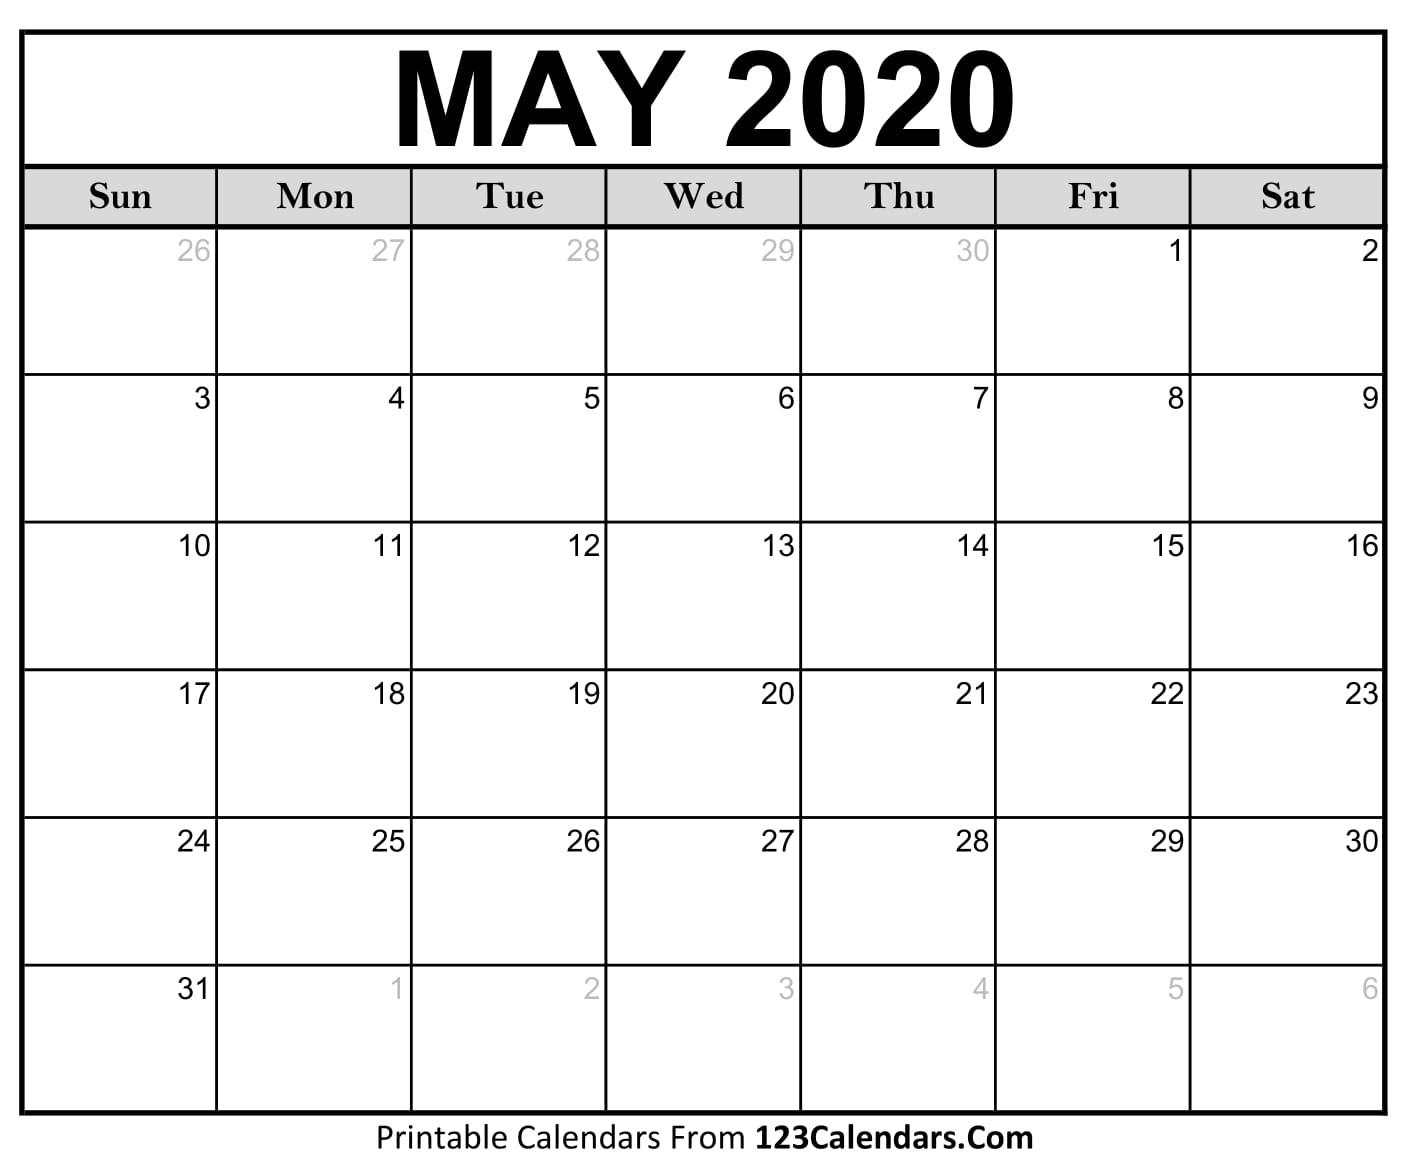 May 2020 Printable Calendar | 123Calendars in Blank 2020 Calendars To Edit